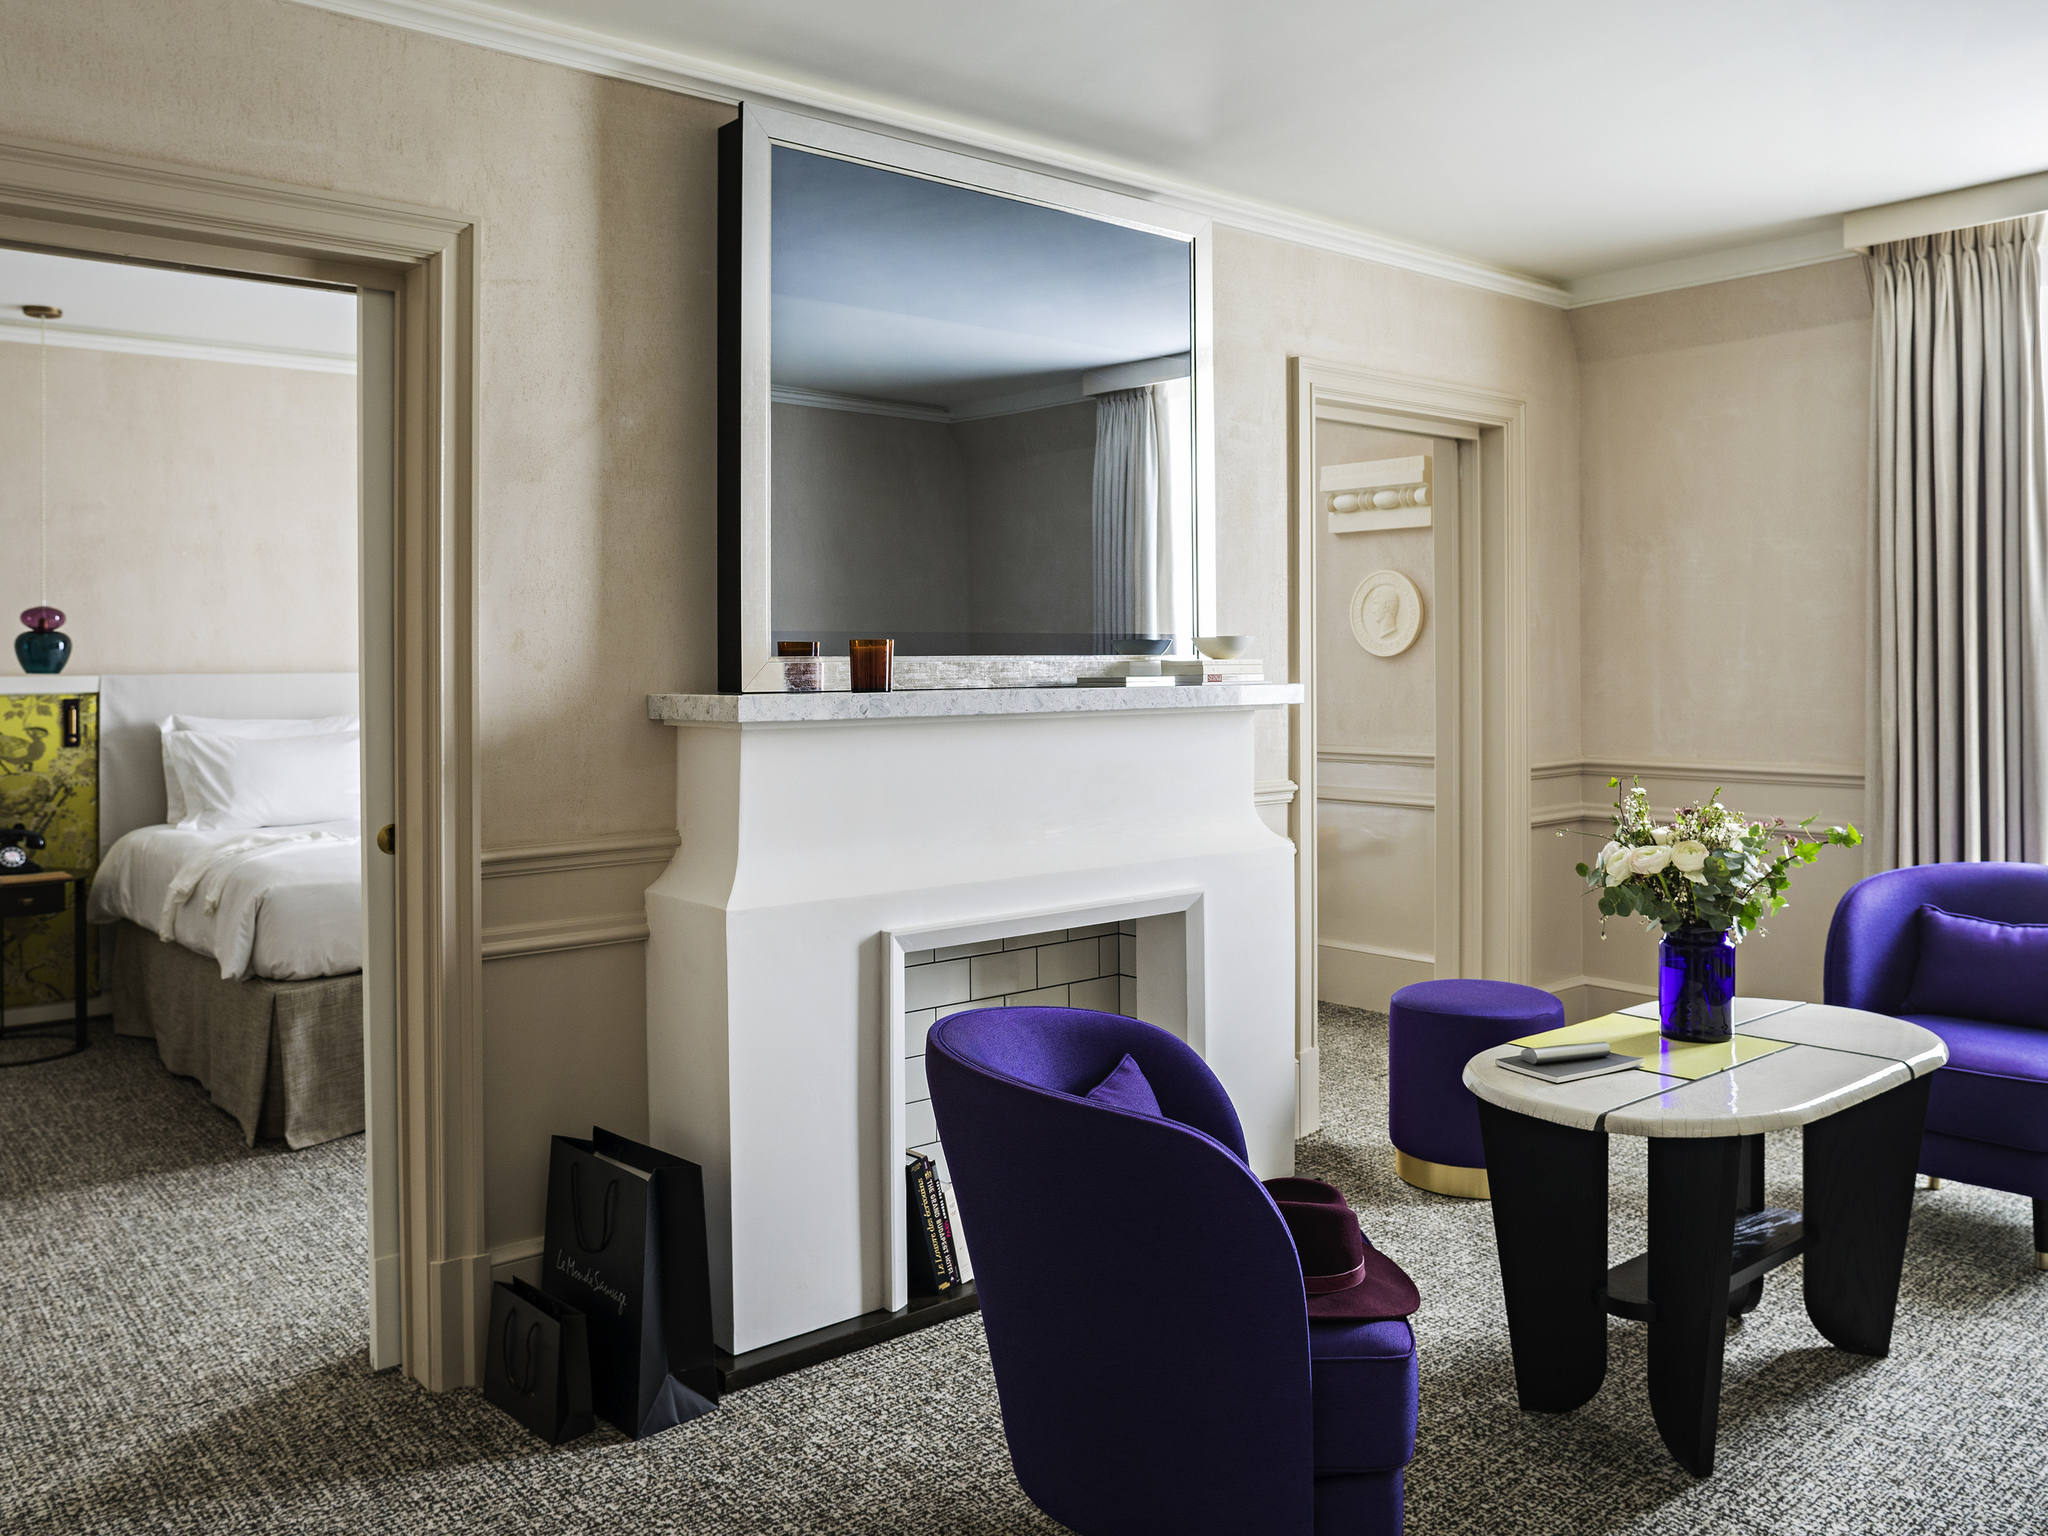 فندق - فندق سكريب باريس أوبرا بإدارة سوفيتل Sofitel